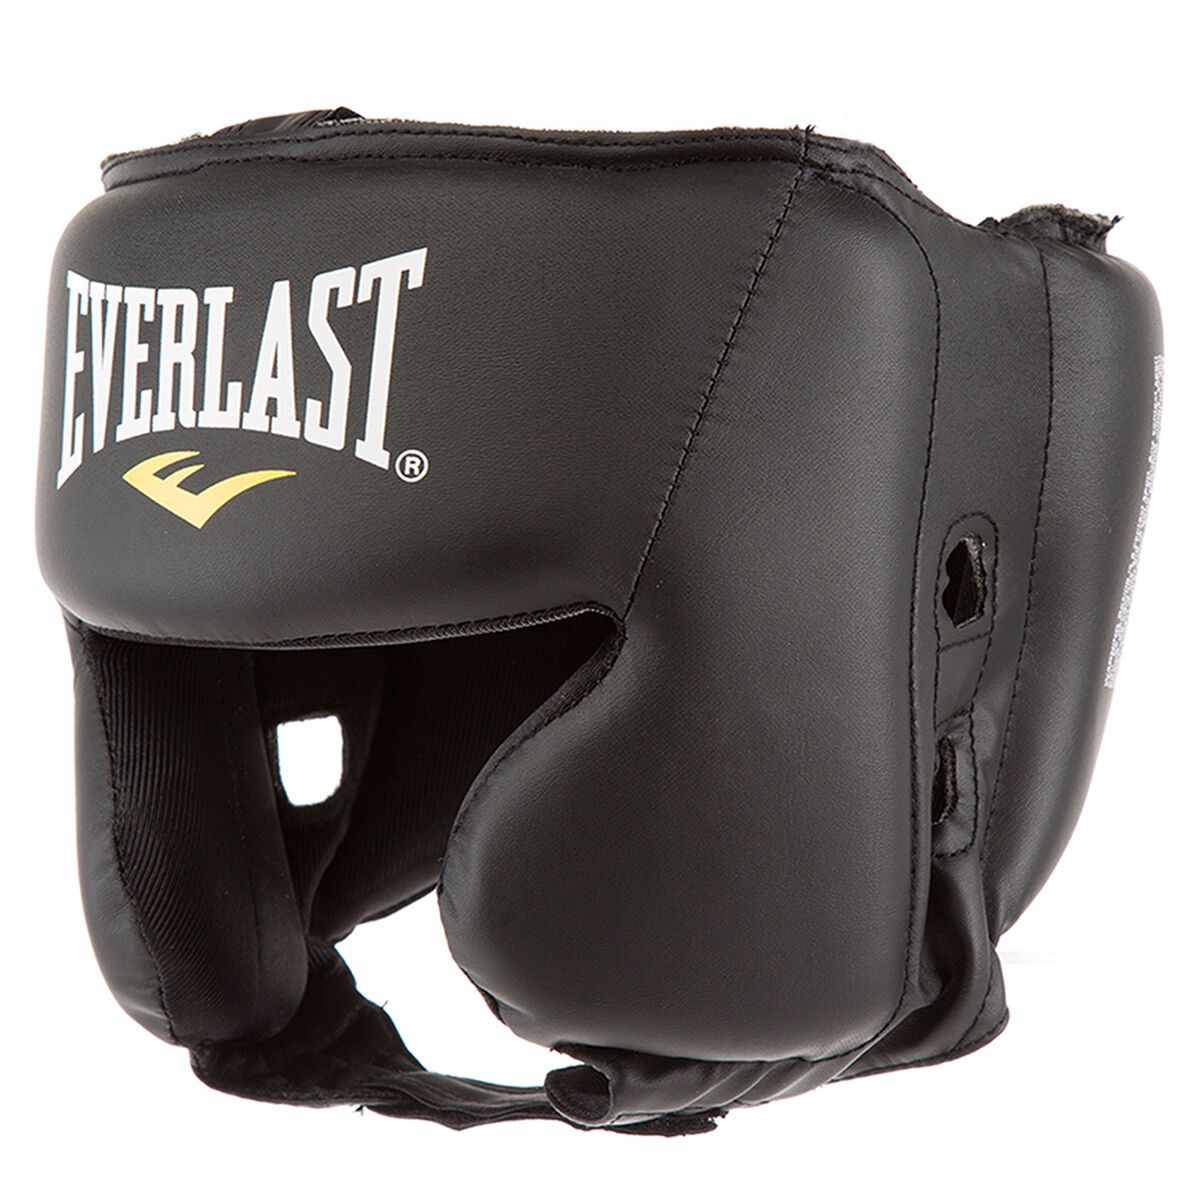 Cabezal de Boxeo Everlast